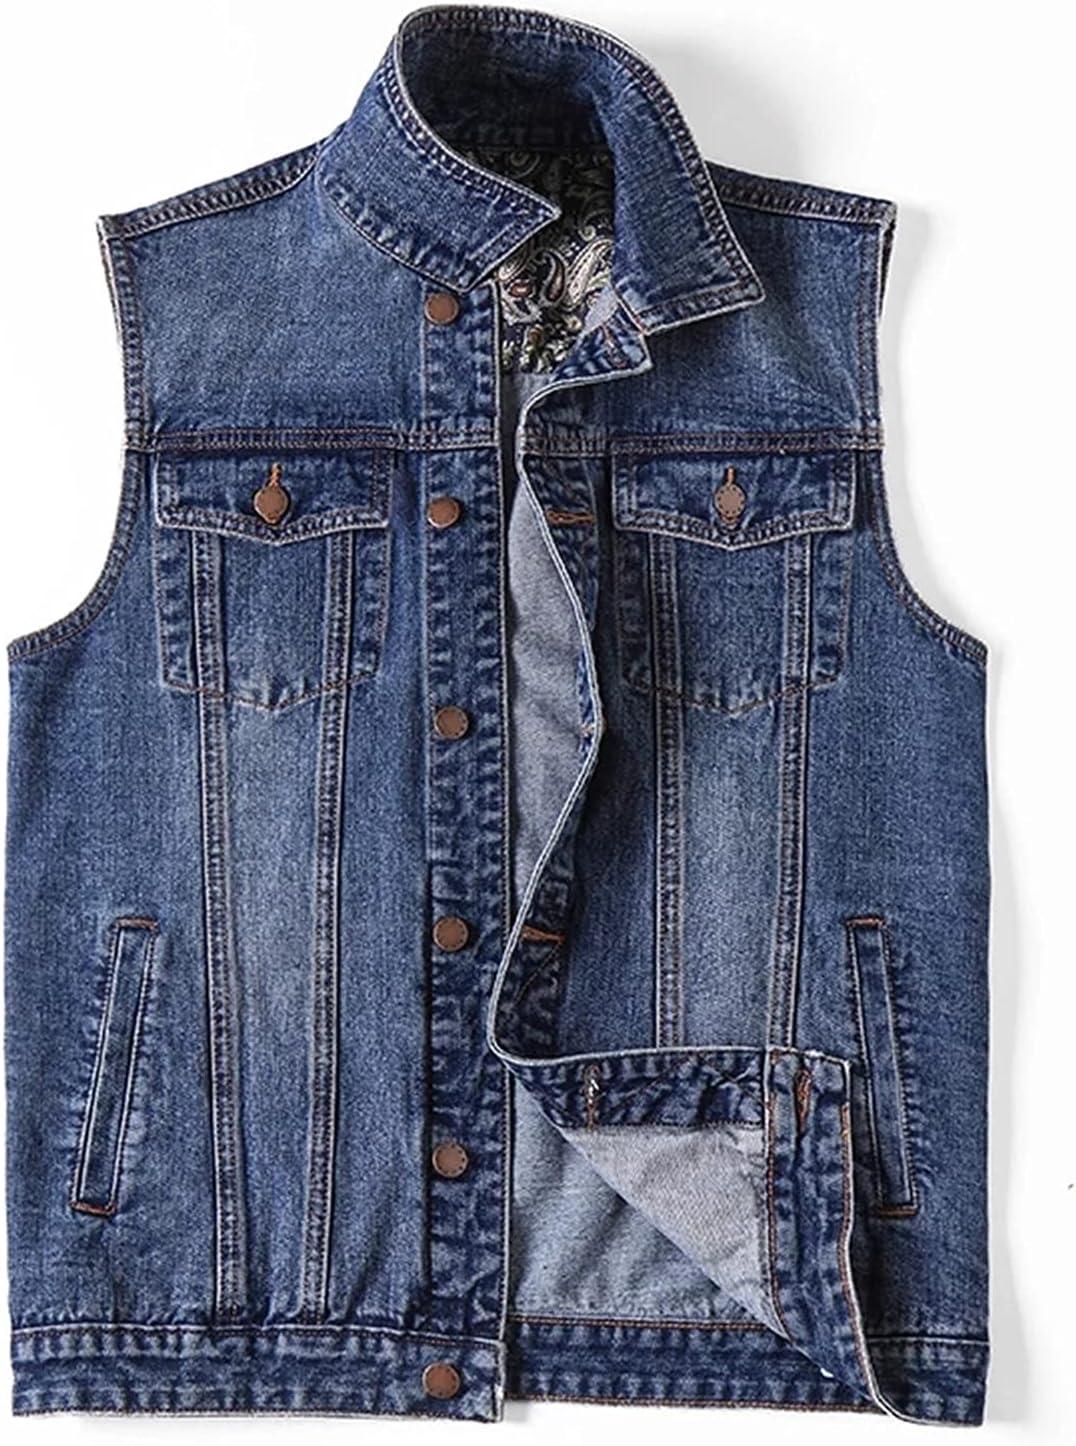 WFEI Men's Denim Vest Large Size 7XL Sleeveless Jacket Summer Fashion Waistcoat Male Casual Lightweight Vest/Gilet,Blue,5XL